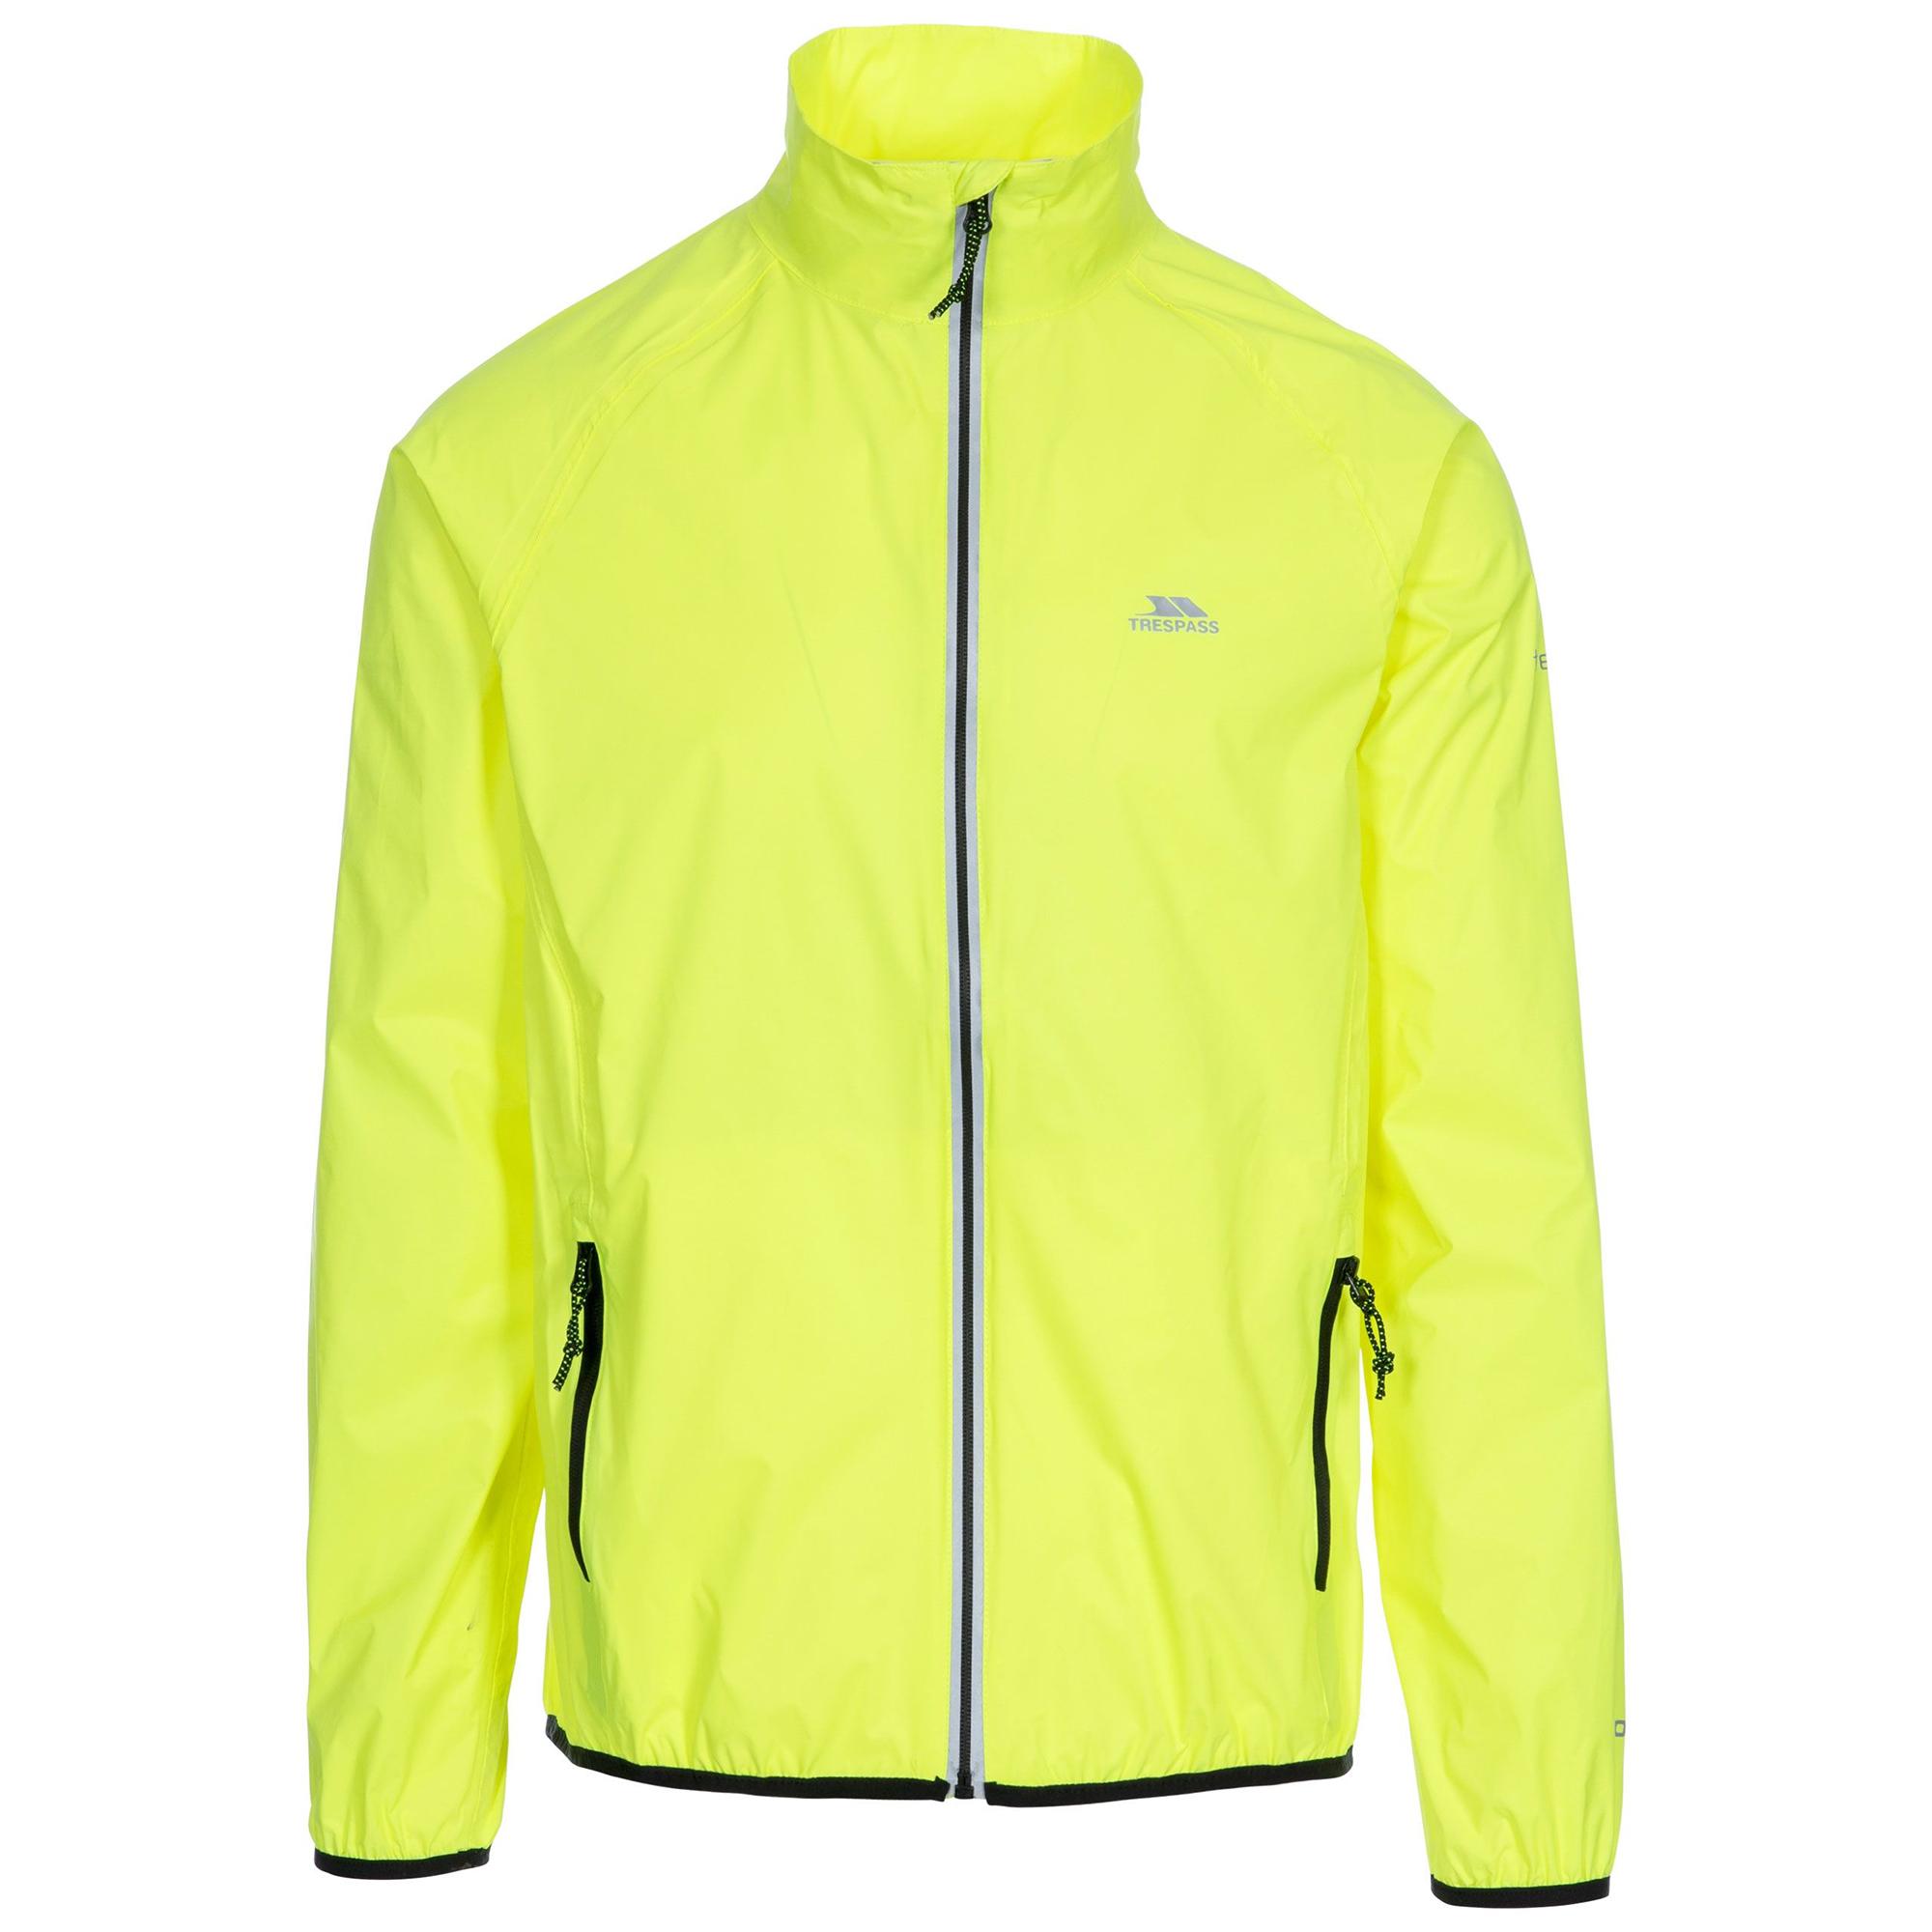 Trespass Mens Retract Hi-Vis Packaway Waterproof Jacket. (S) (Hi Visibility Yellow)